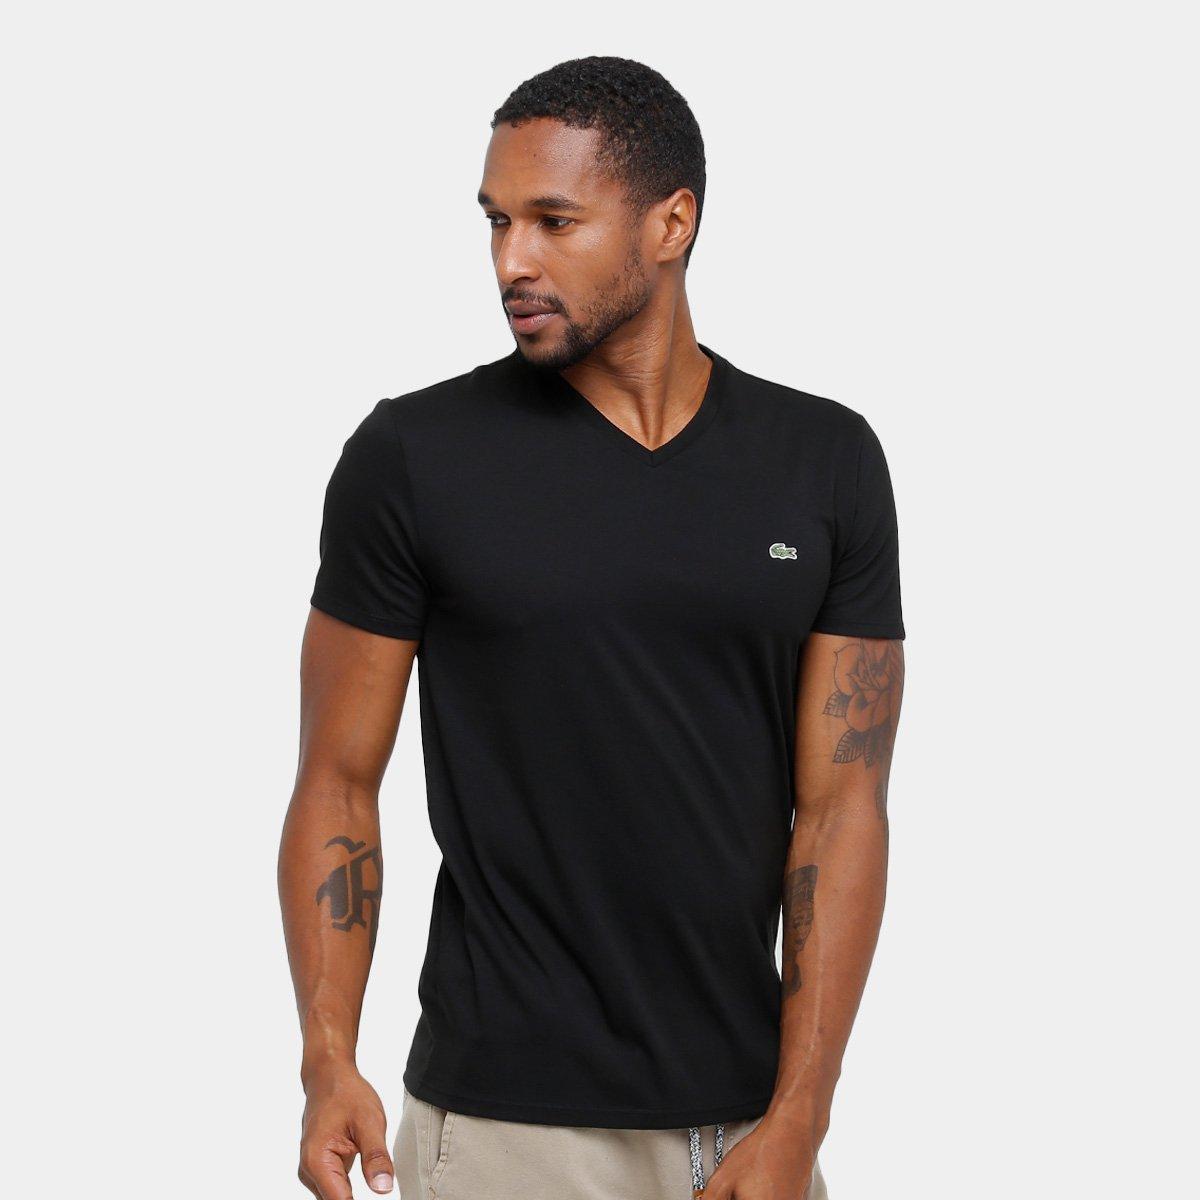 4f854986e8 Camiseta Lacoste Gola V Regular Fit Masculina - Compre Agora